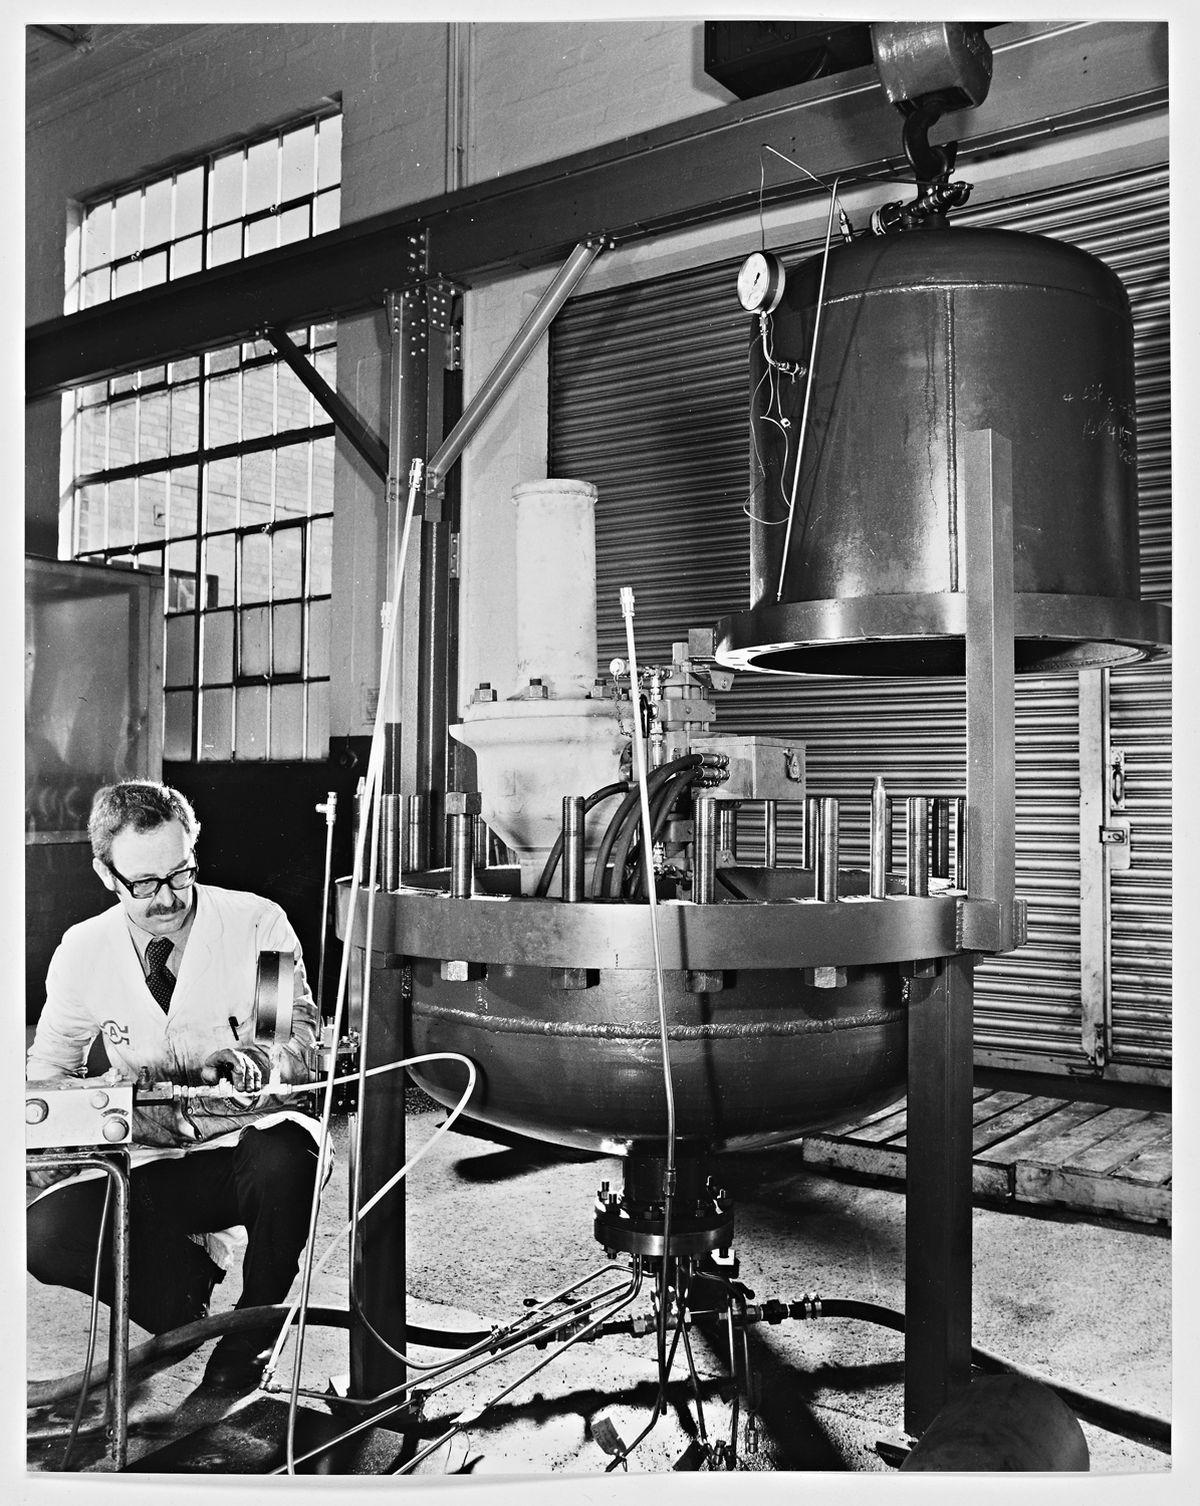 Serck Audco Valves Ltd, Newport – February 23, 1984 . Flotation valves.